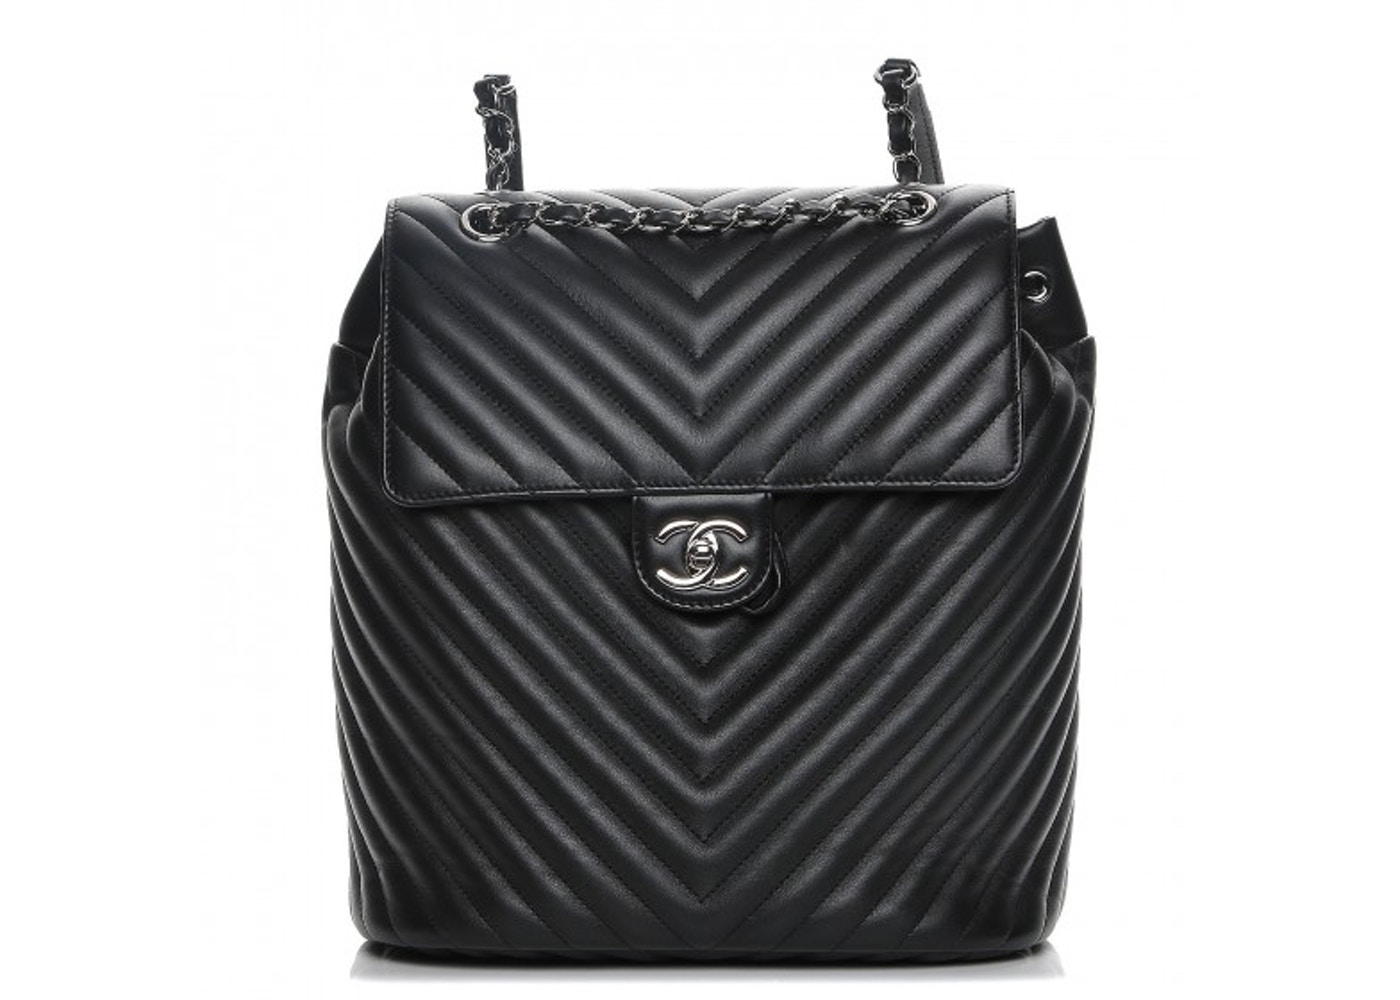 f200b9f0f087 Buy   Sell Chanel Handbags - Featured